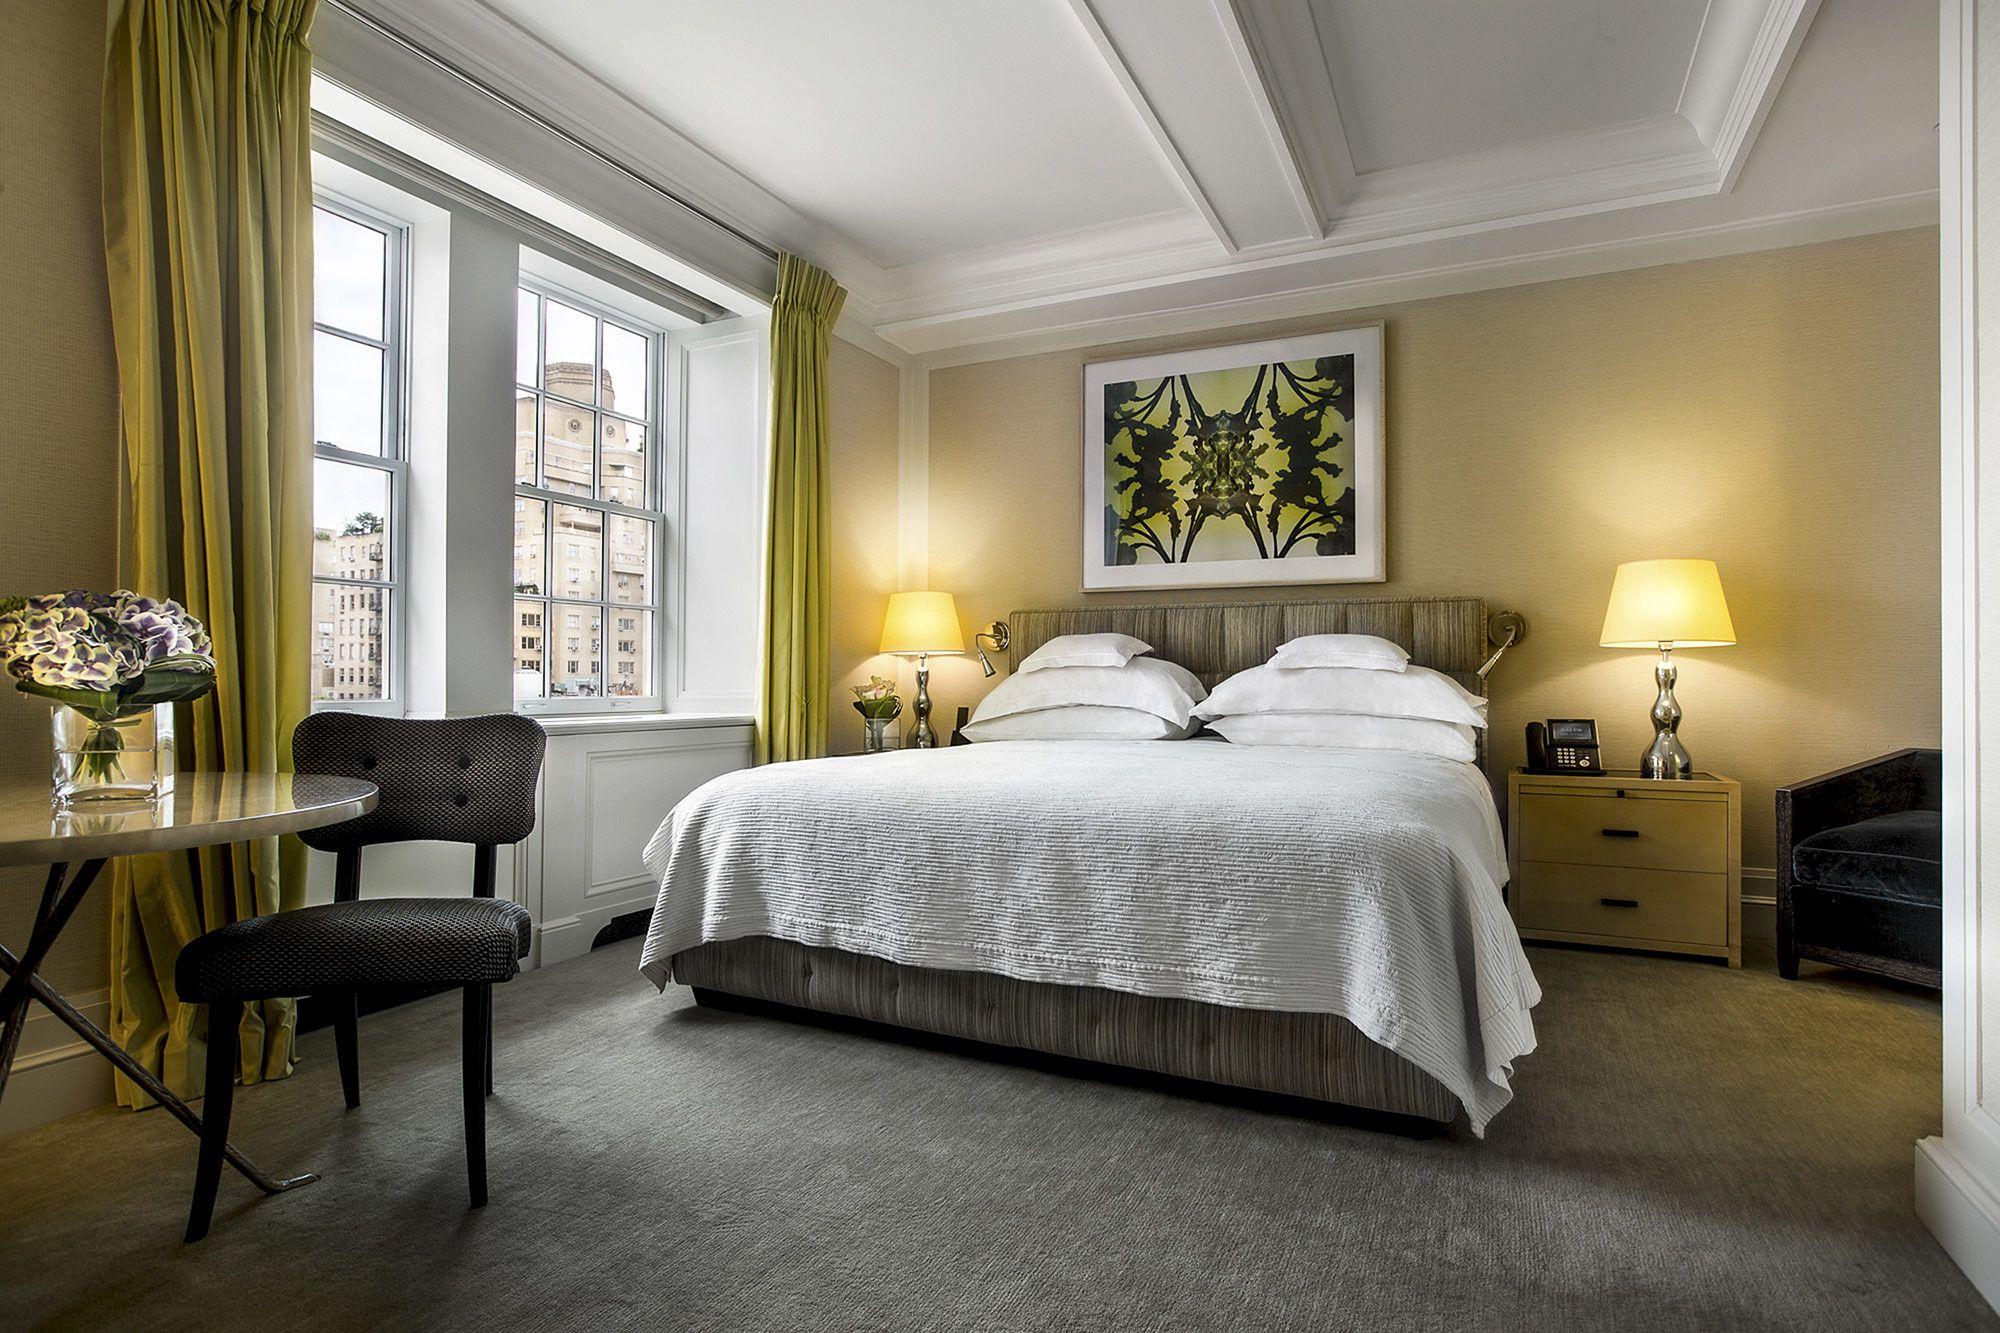 Luxury Studios in Manhattan New York Room, Home deco